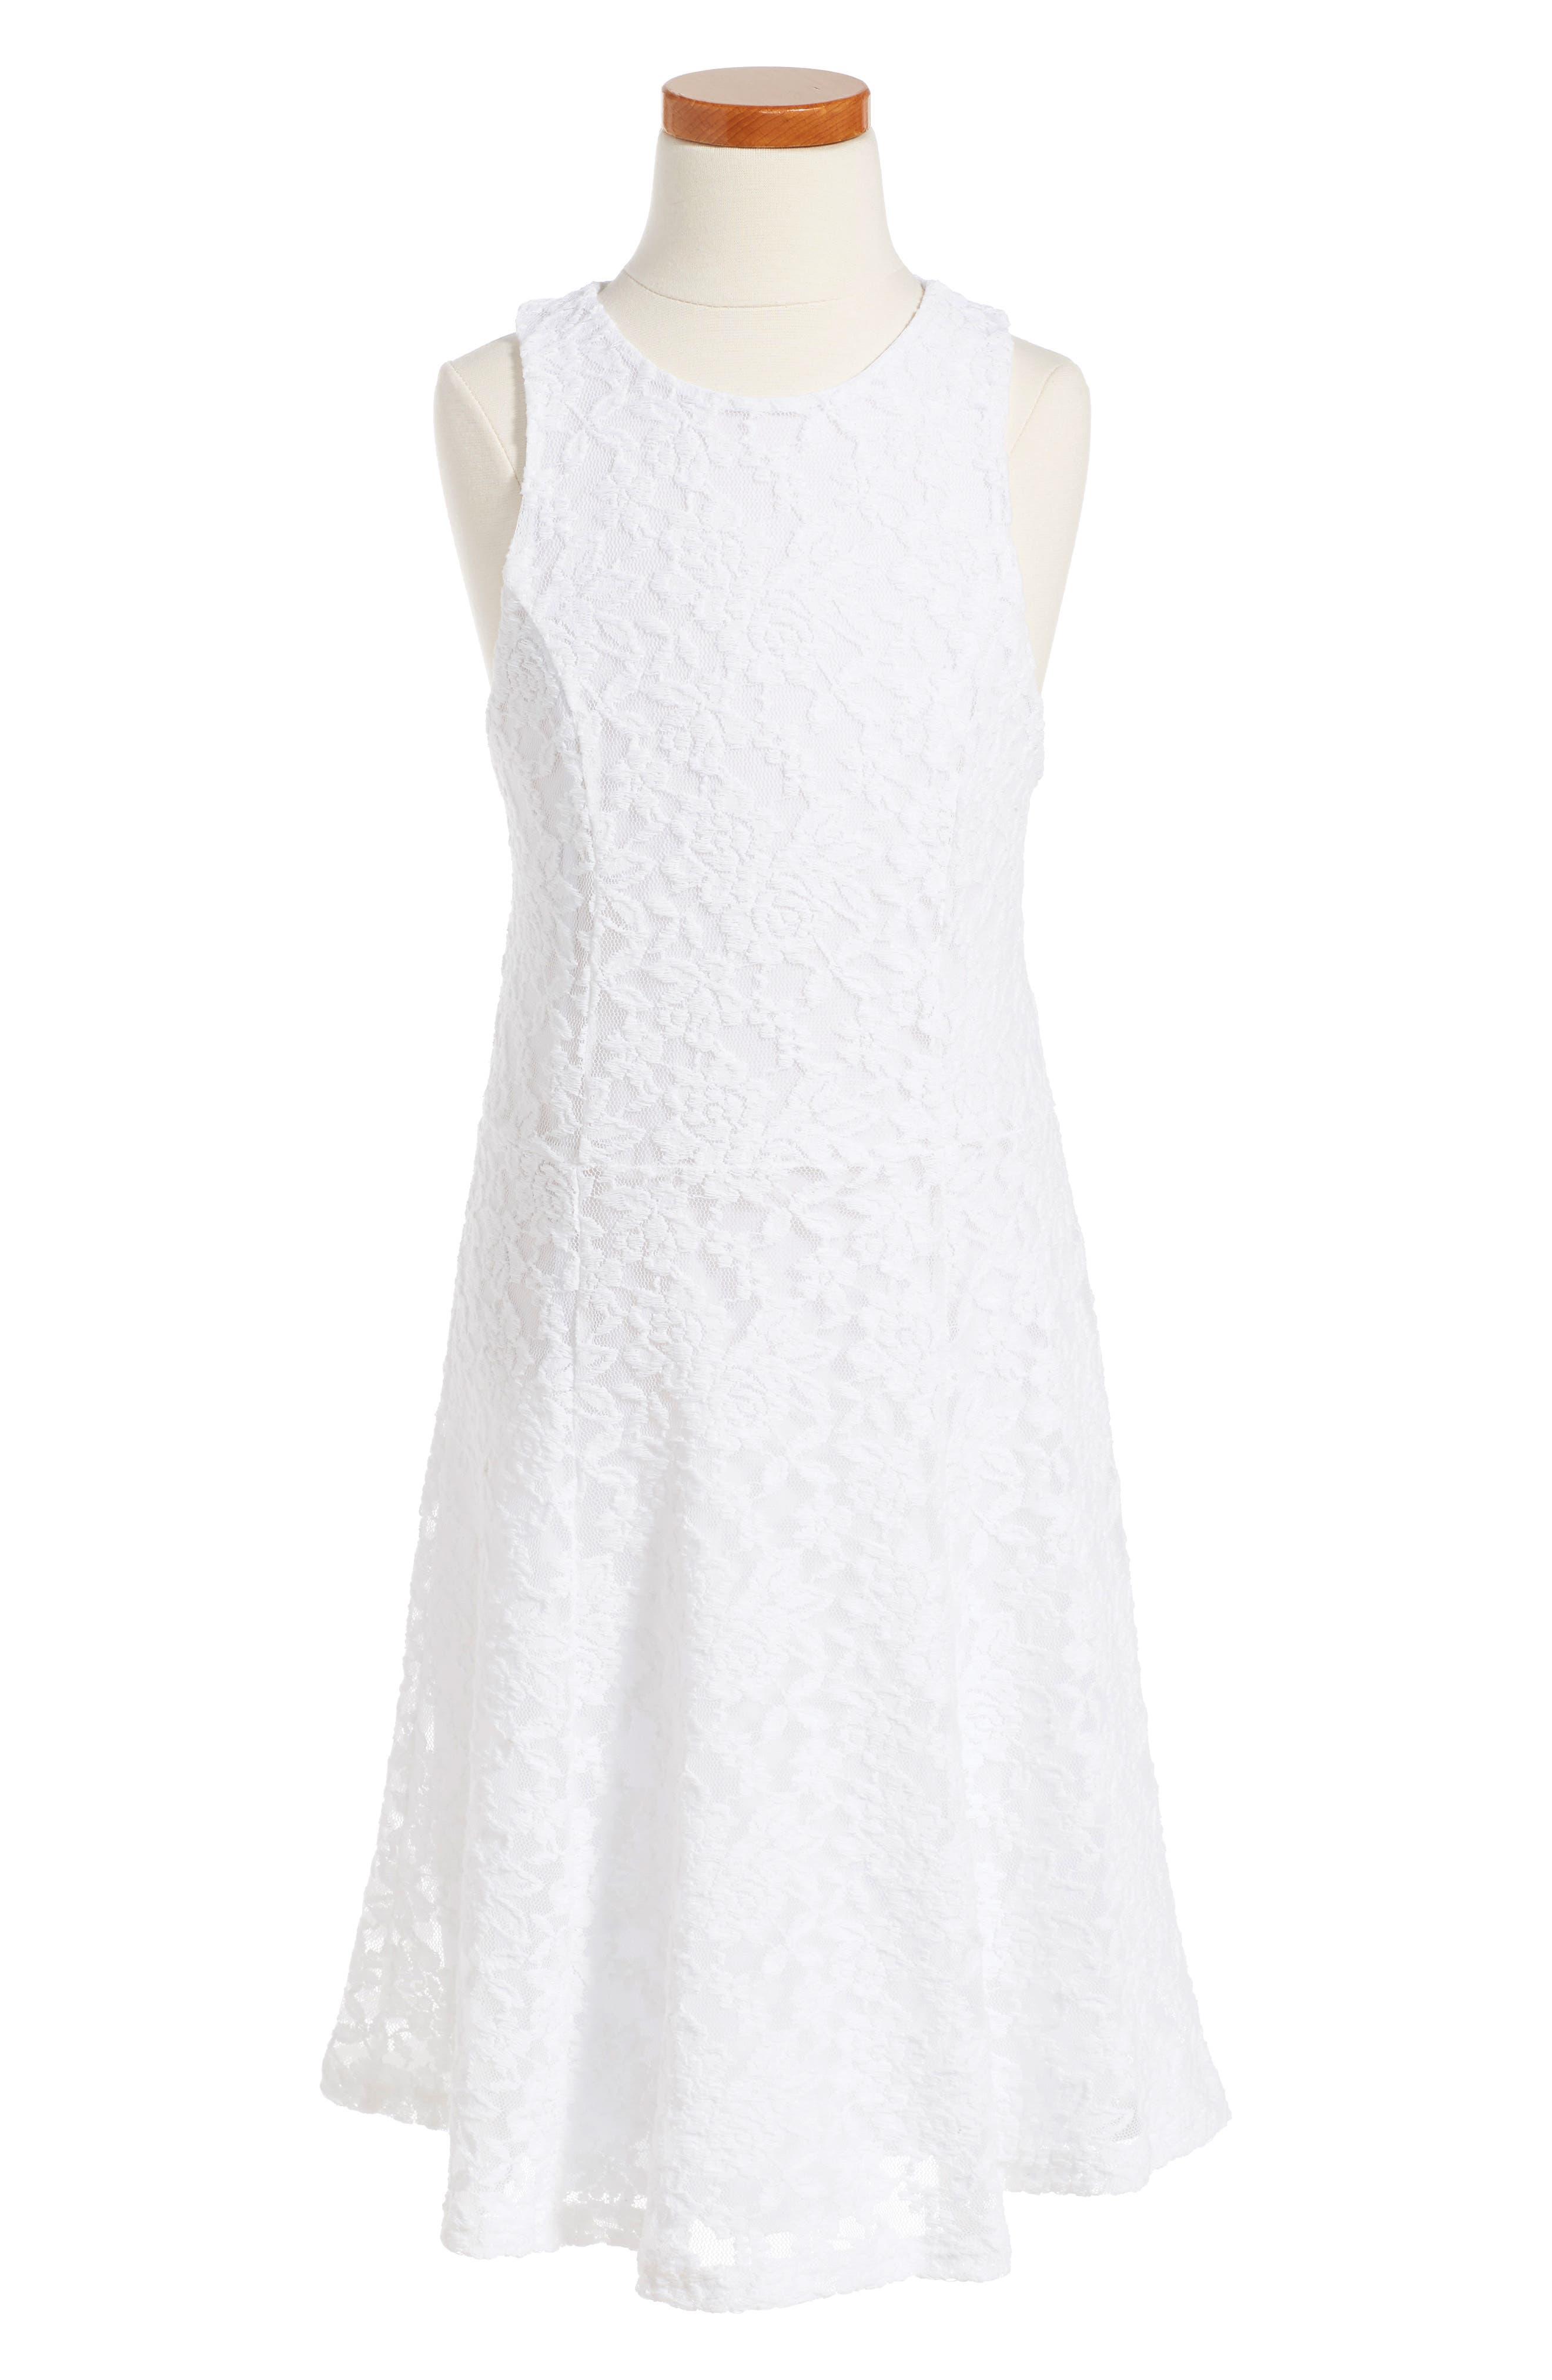 RUBY & BLOOM Lace Dress